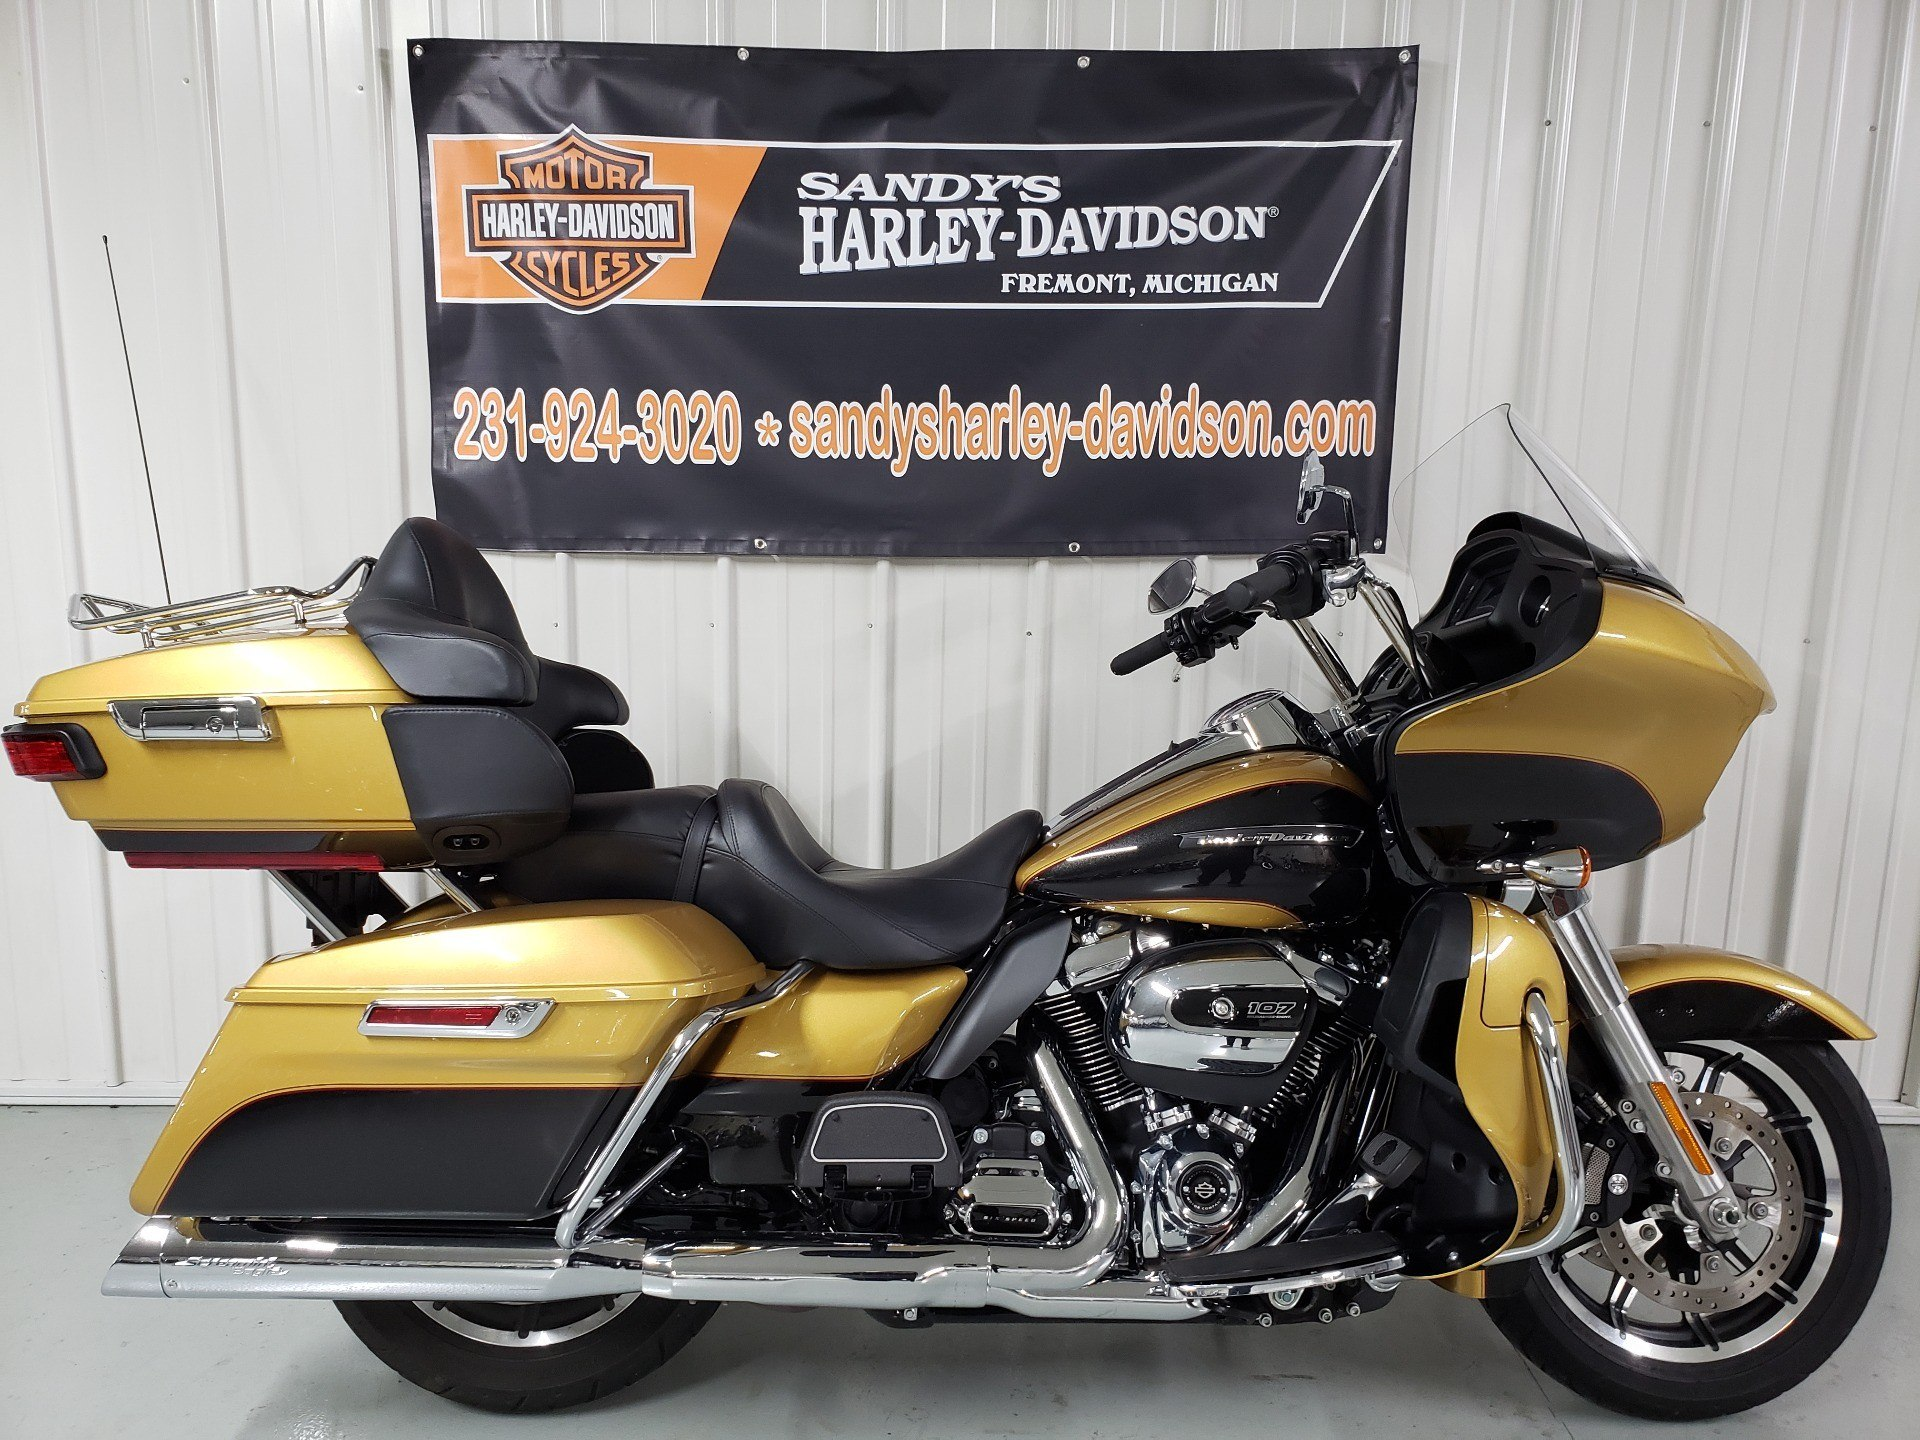 2017 Road Glide Ultra >> 2017 Harley Davidson Road Glide Ultra In Fremont Michigan